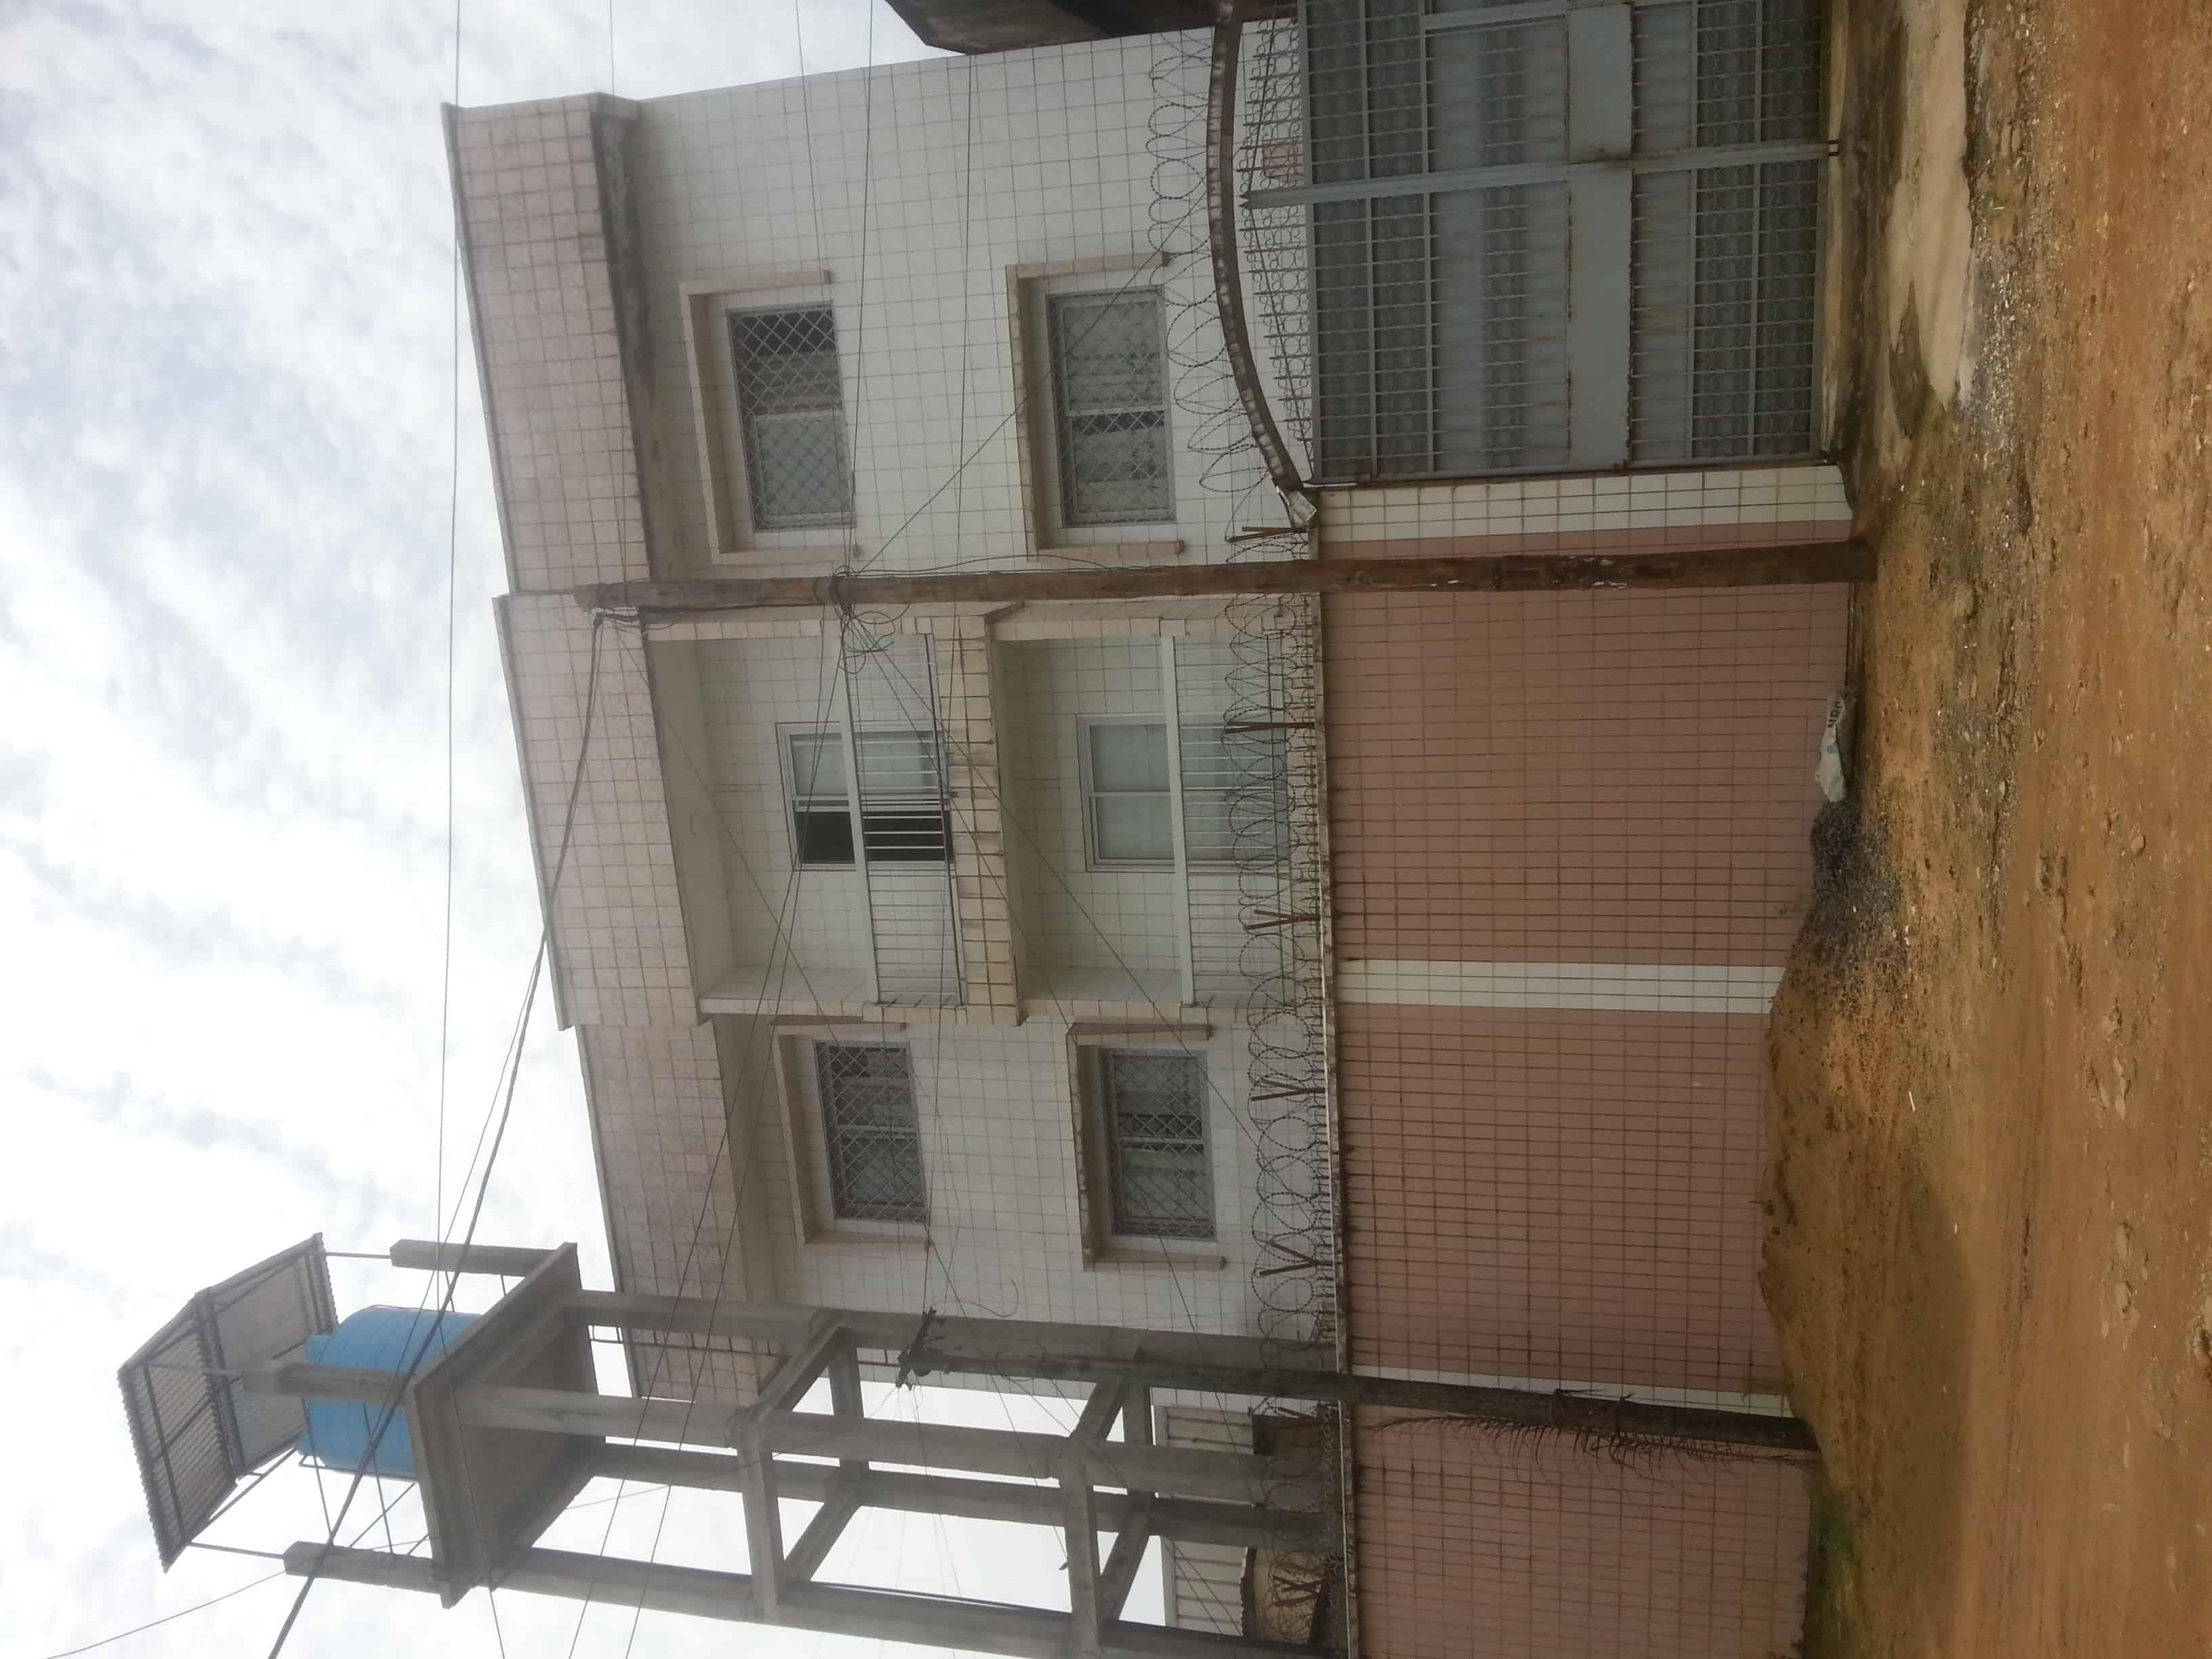 House (Triplex) for sale - Douala, Ndogbong, ndogbong - 2 living room(s), 6 bedroom(s), 5 bathroom(s) - 145 000 000 FCFA / month